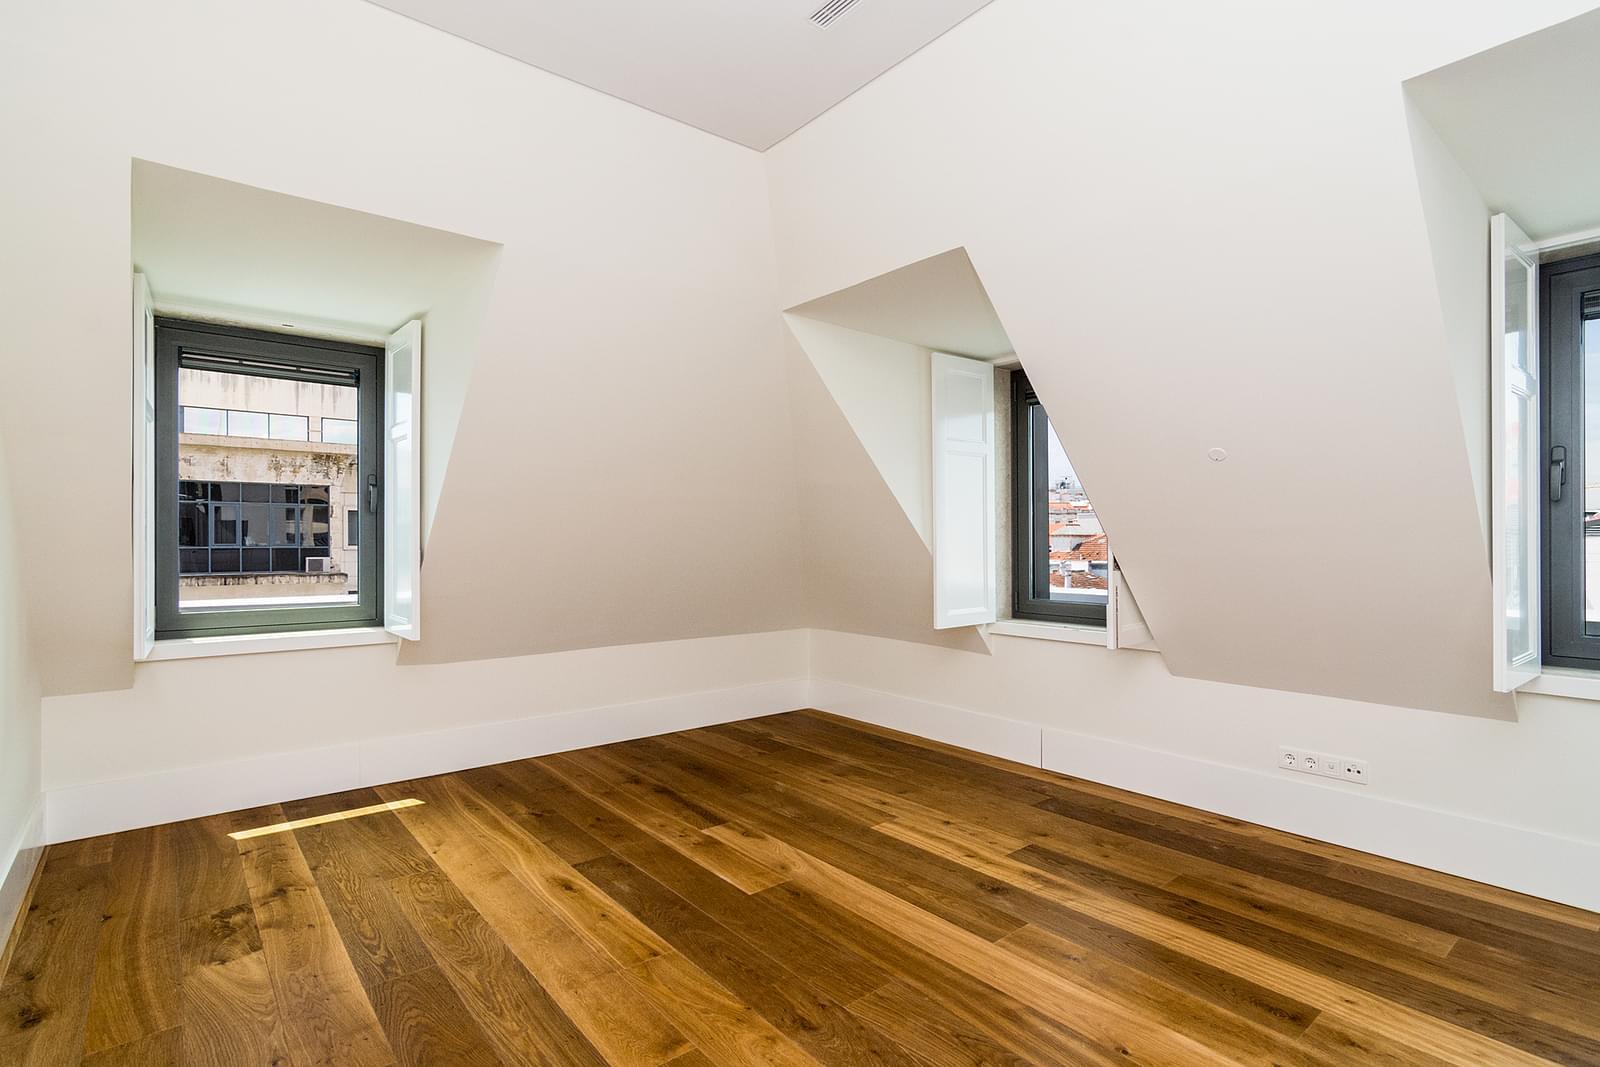 pf17442-apartamento-t3-lisboa-a5cc1f0d-d442-48fc-9d25-eceb58c2a1c9